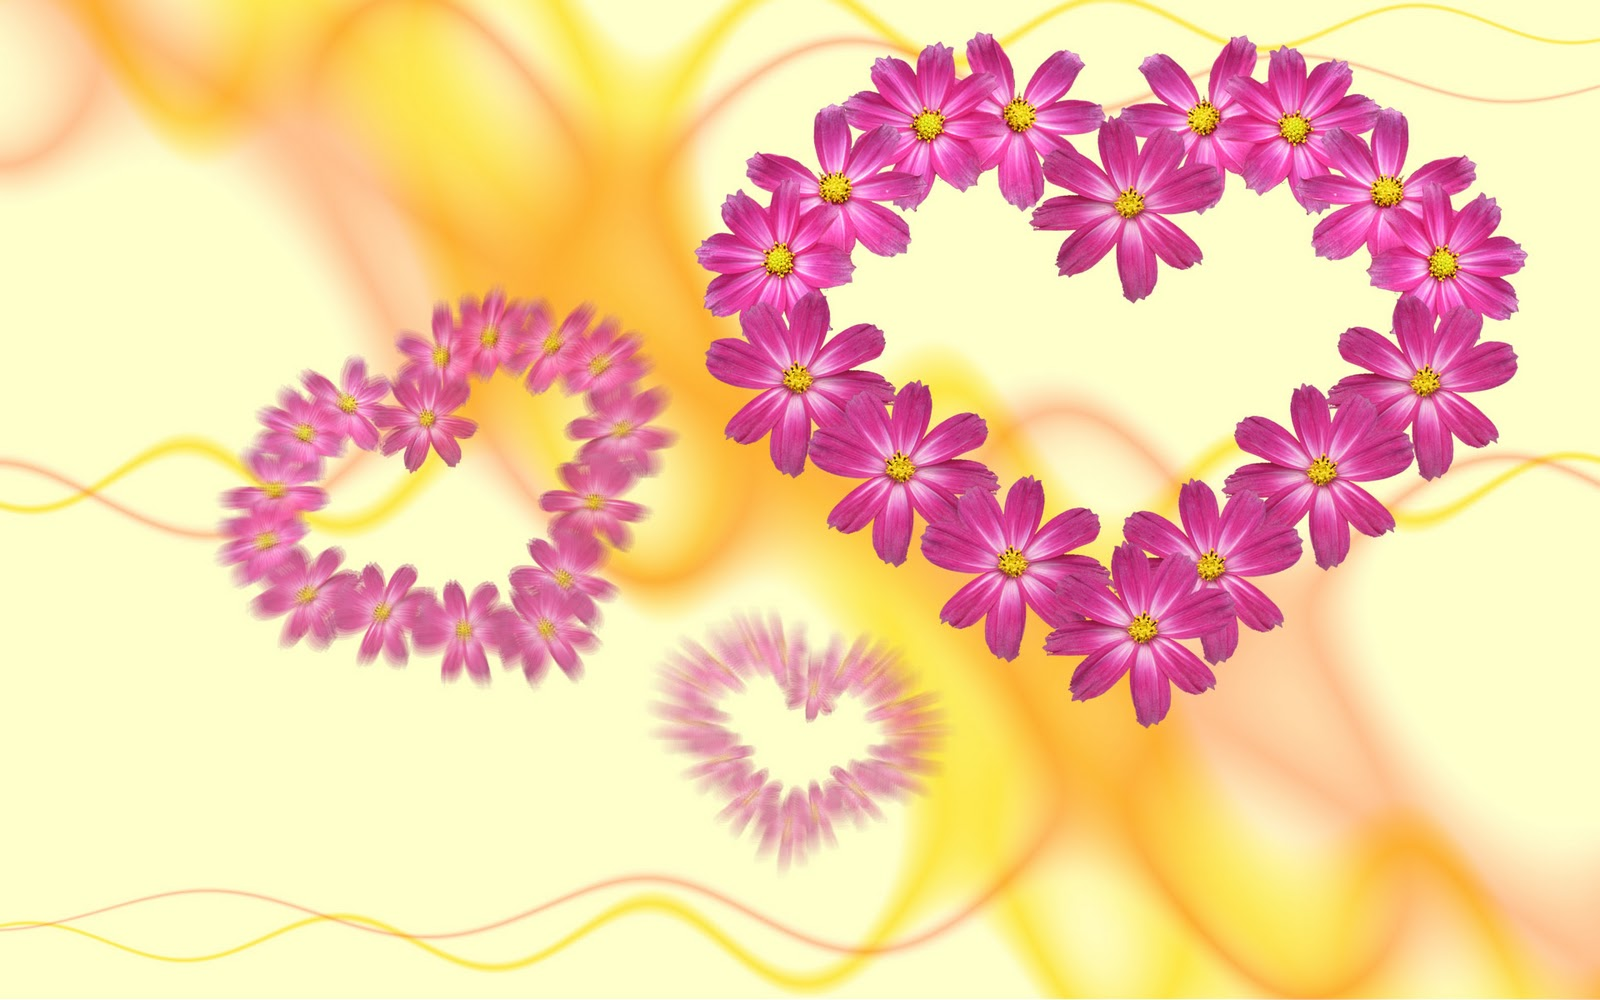 heart flower wallpaper  wallpapersafari, Beautiful flower